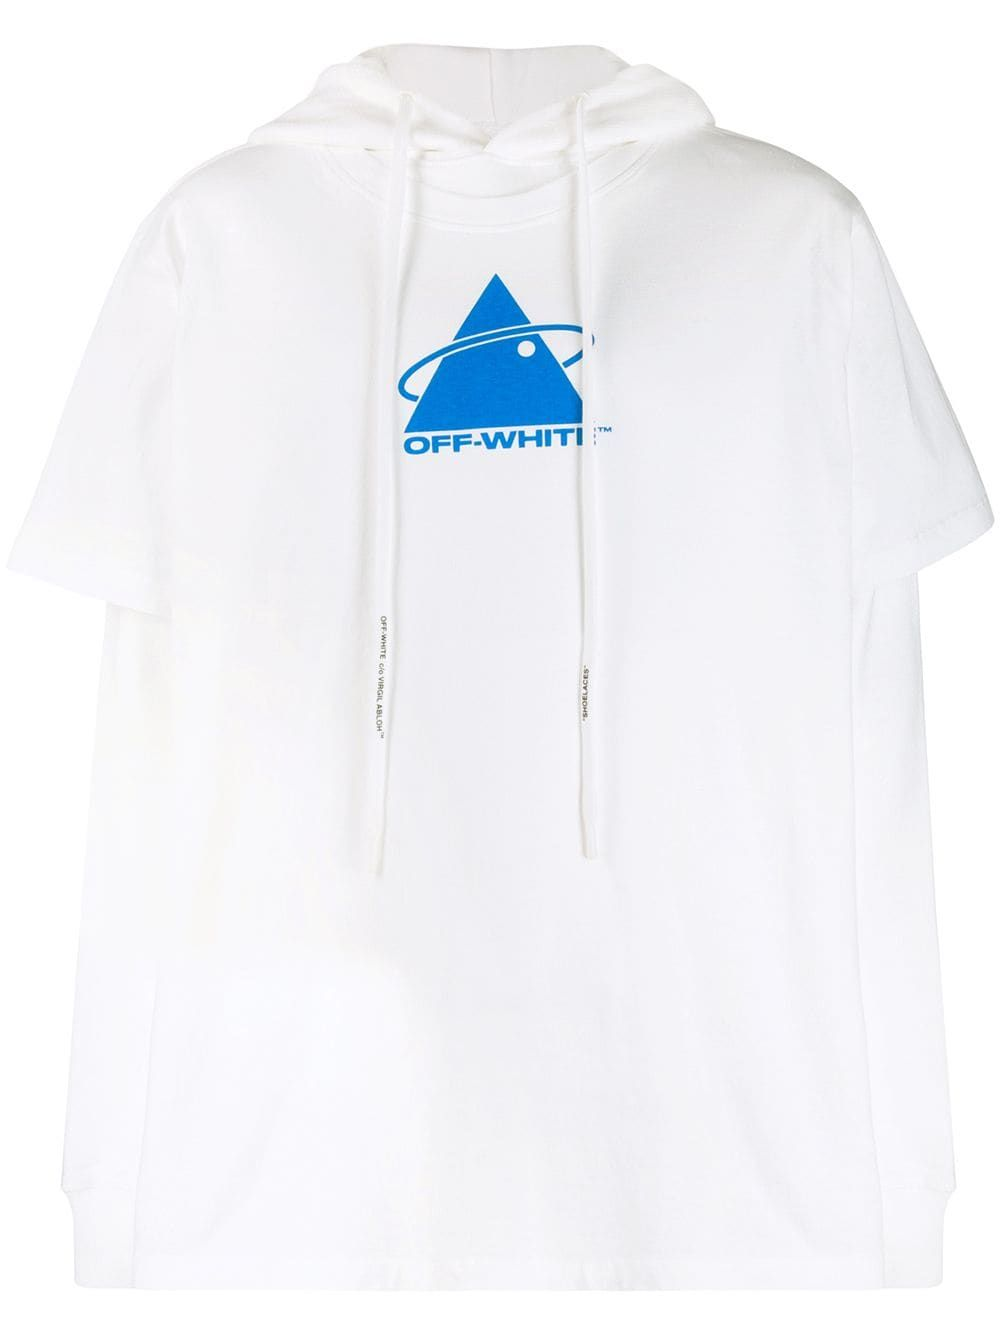 Off White Triangle Double T Shirt Hoodie Farfetch [ 1334 x 1000 Pixel ]